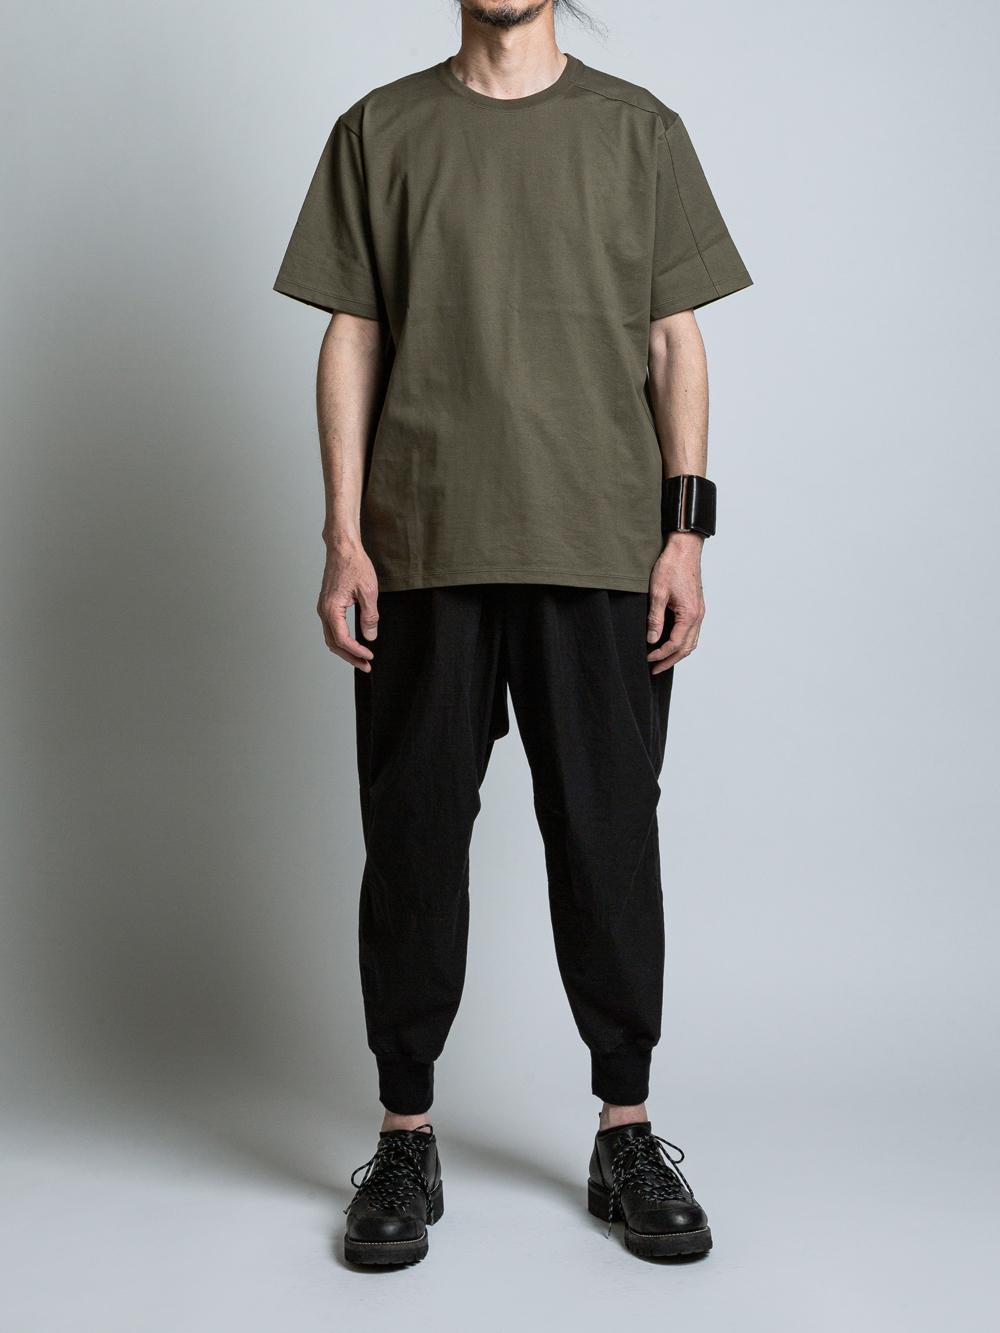 VI-SP-065-01 / コットン天竺Tシャツ